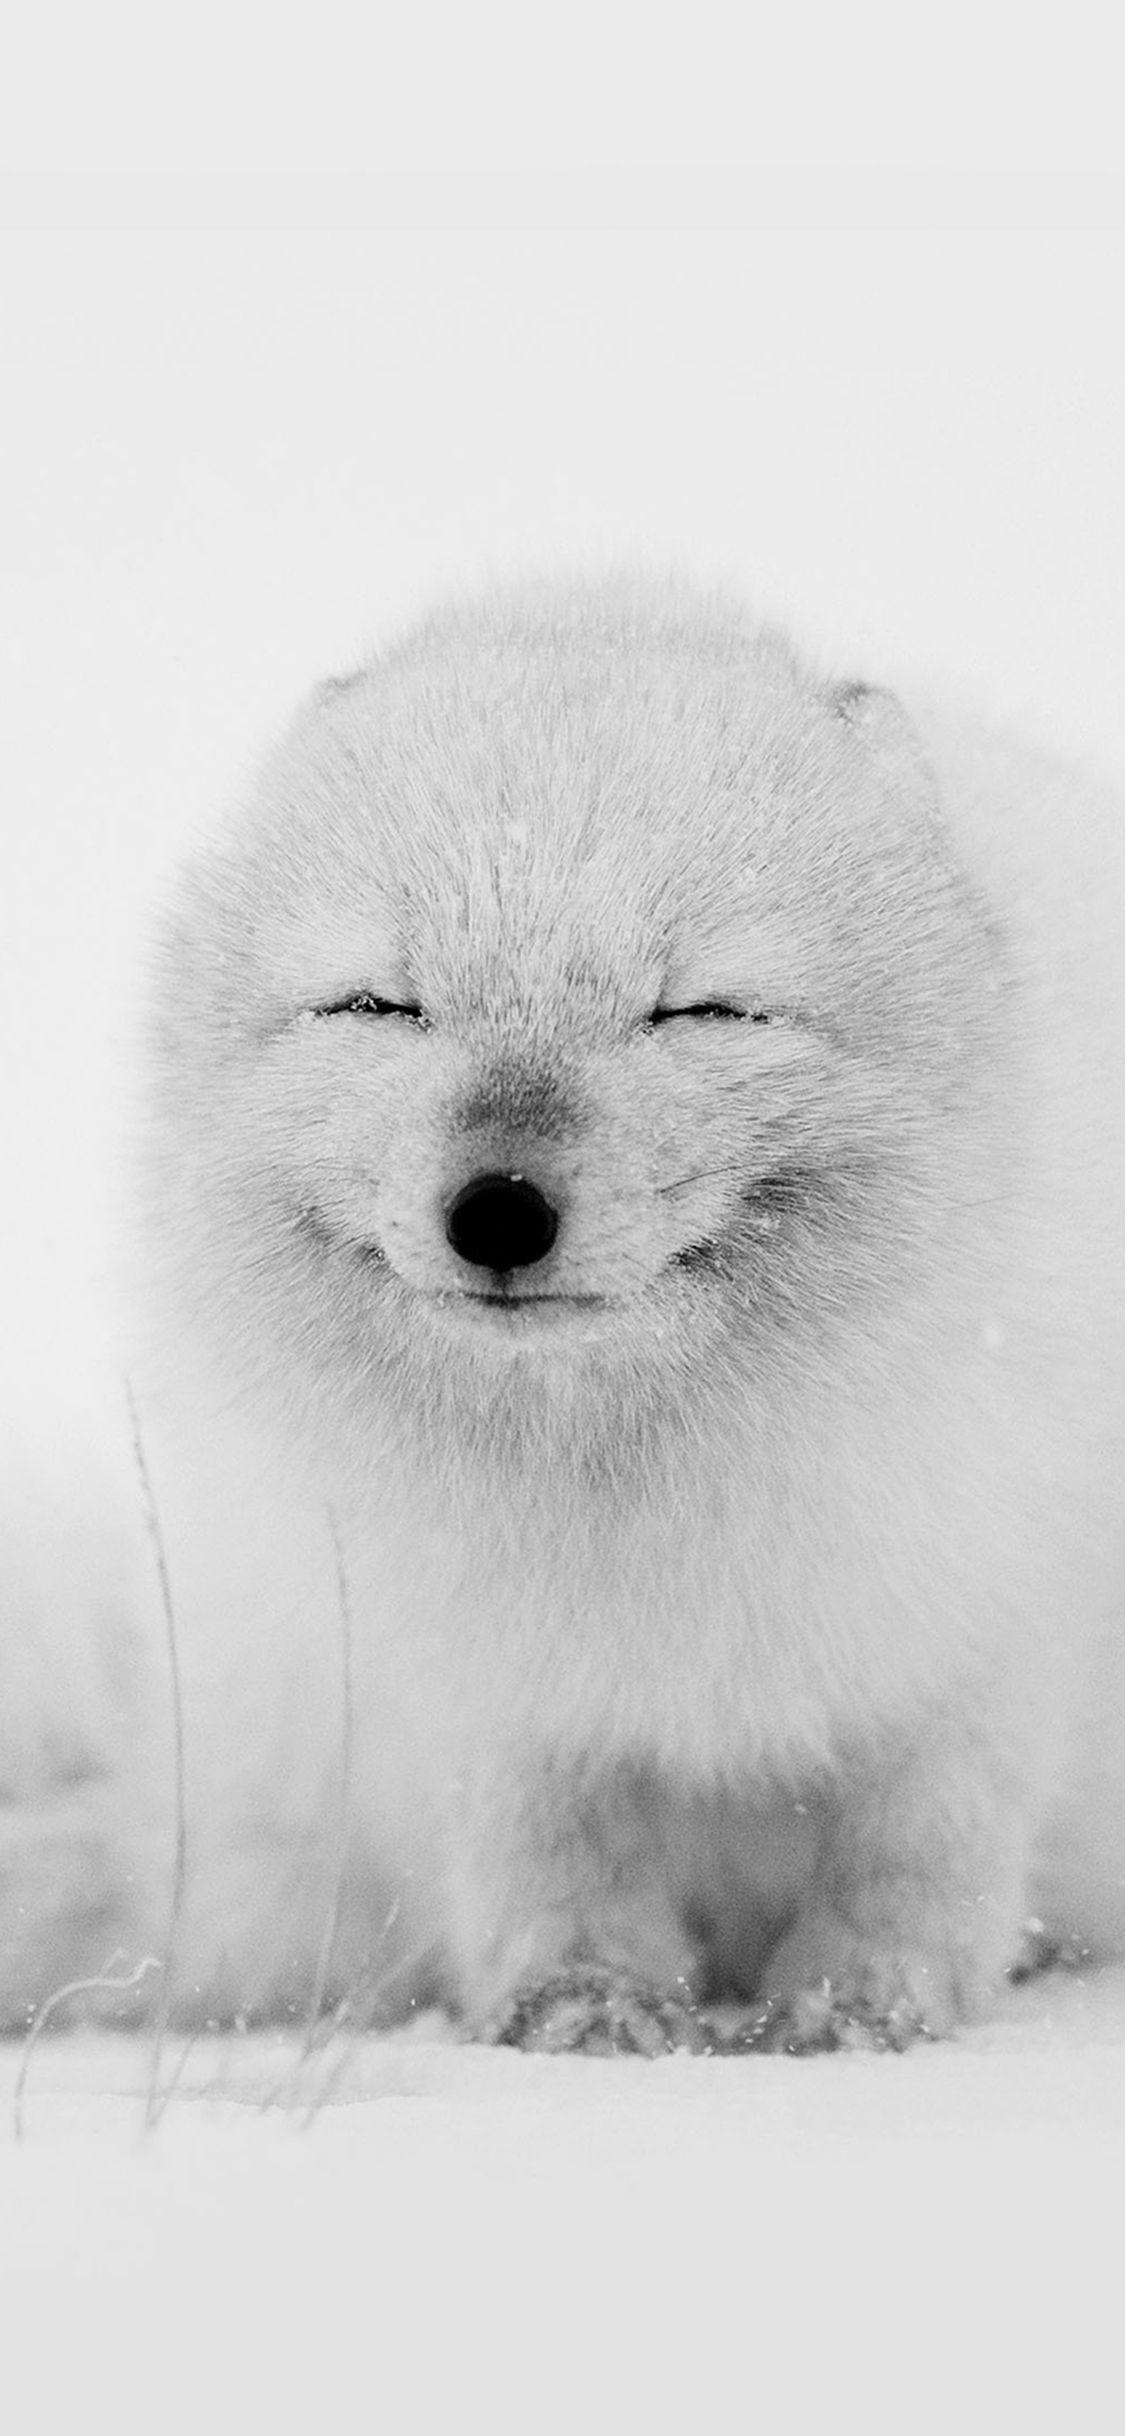 Arctic Fox Happy Moment Iphone X Wallpaper Iphone X Wallpapers